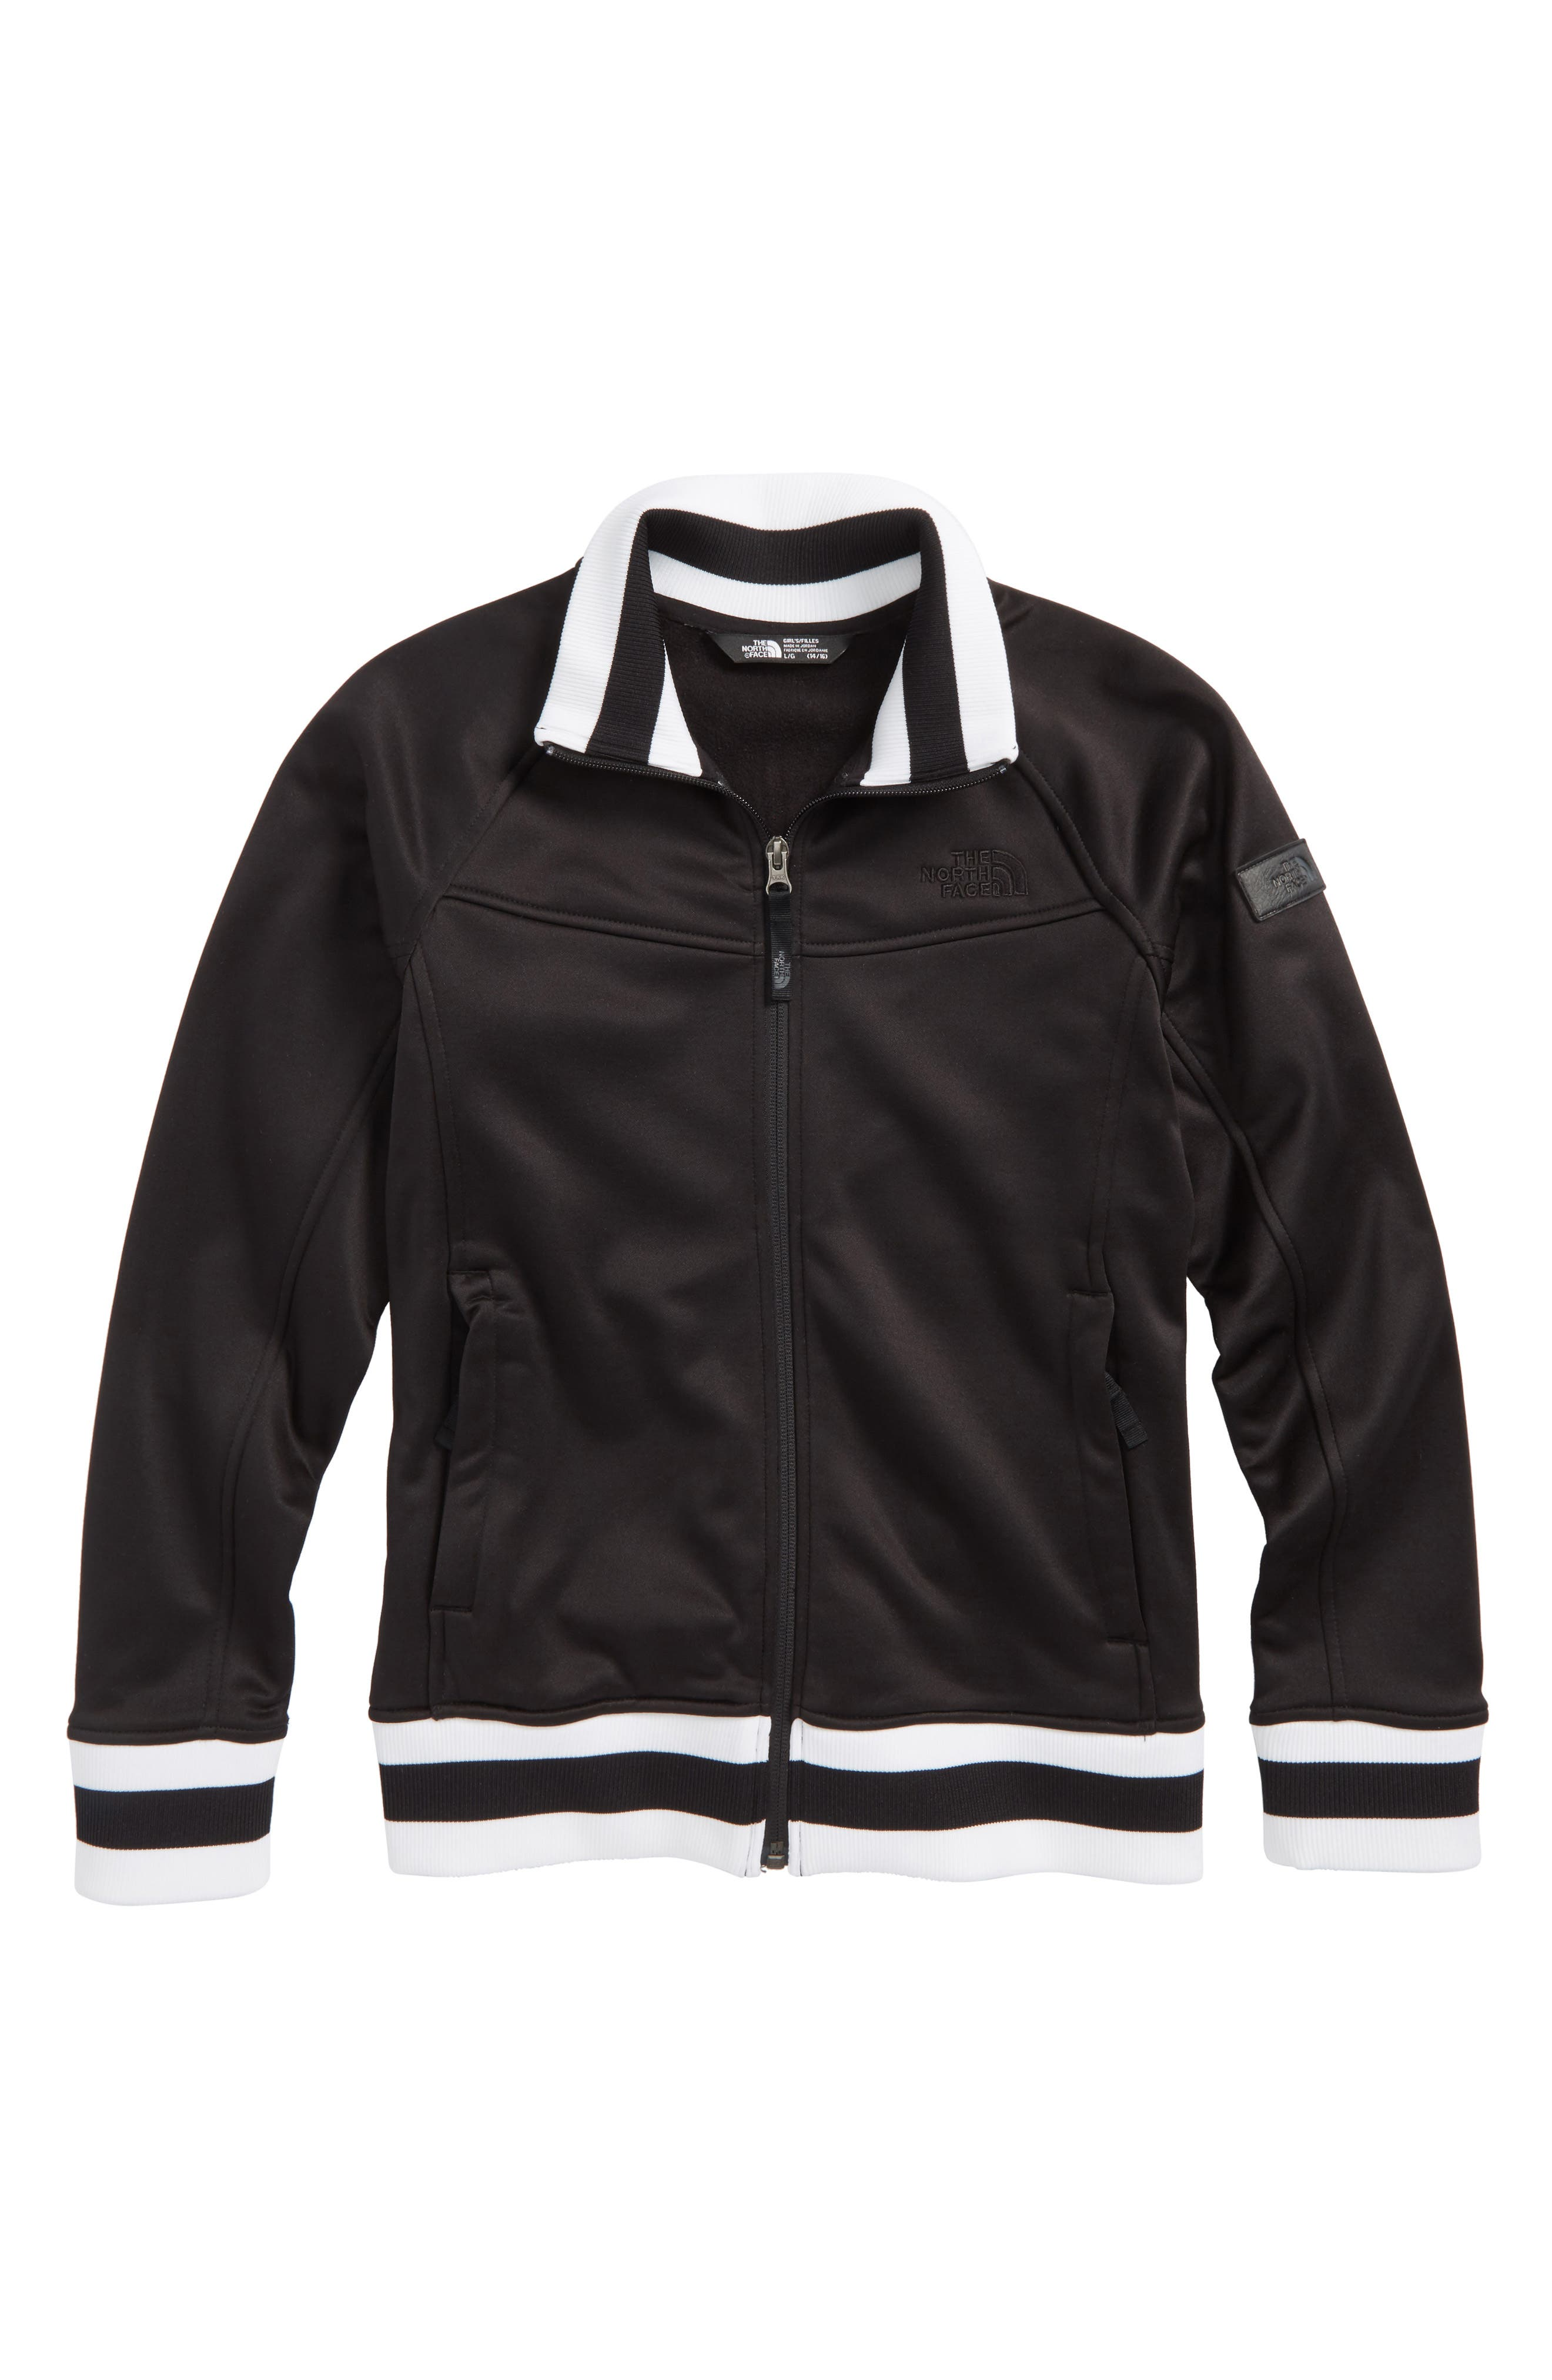 Takeback Track Jacket,                             Main thumbnail 1, color,                             Black